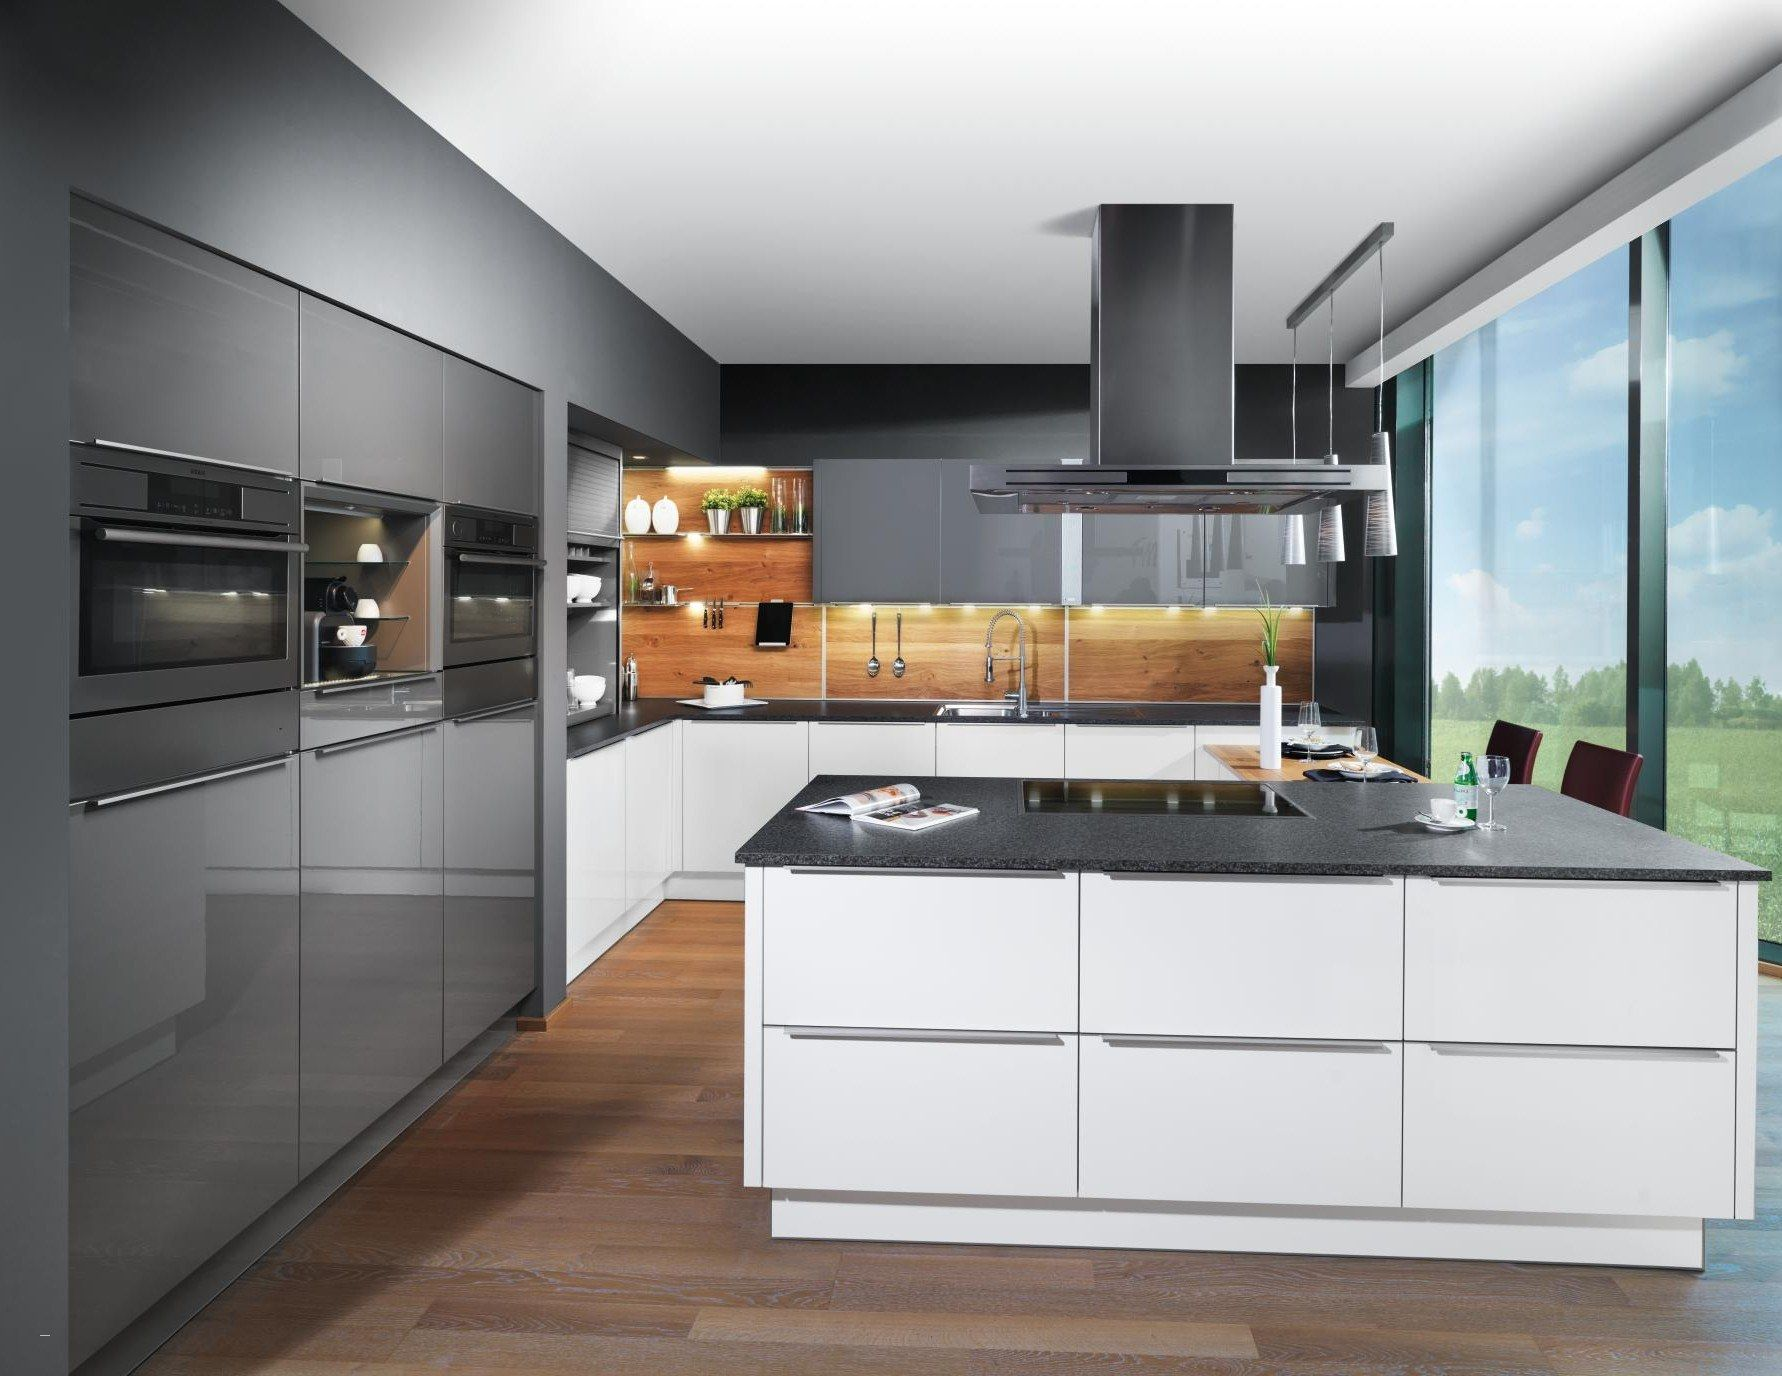 Kuche Mit Holzboden Beliebt Kuchen Wandfliesen Modern Magnolia